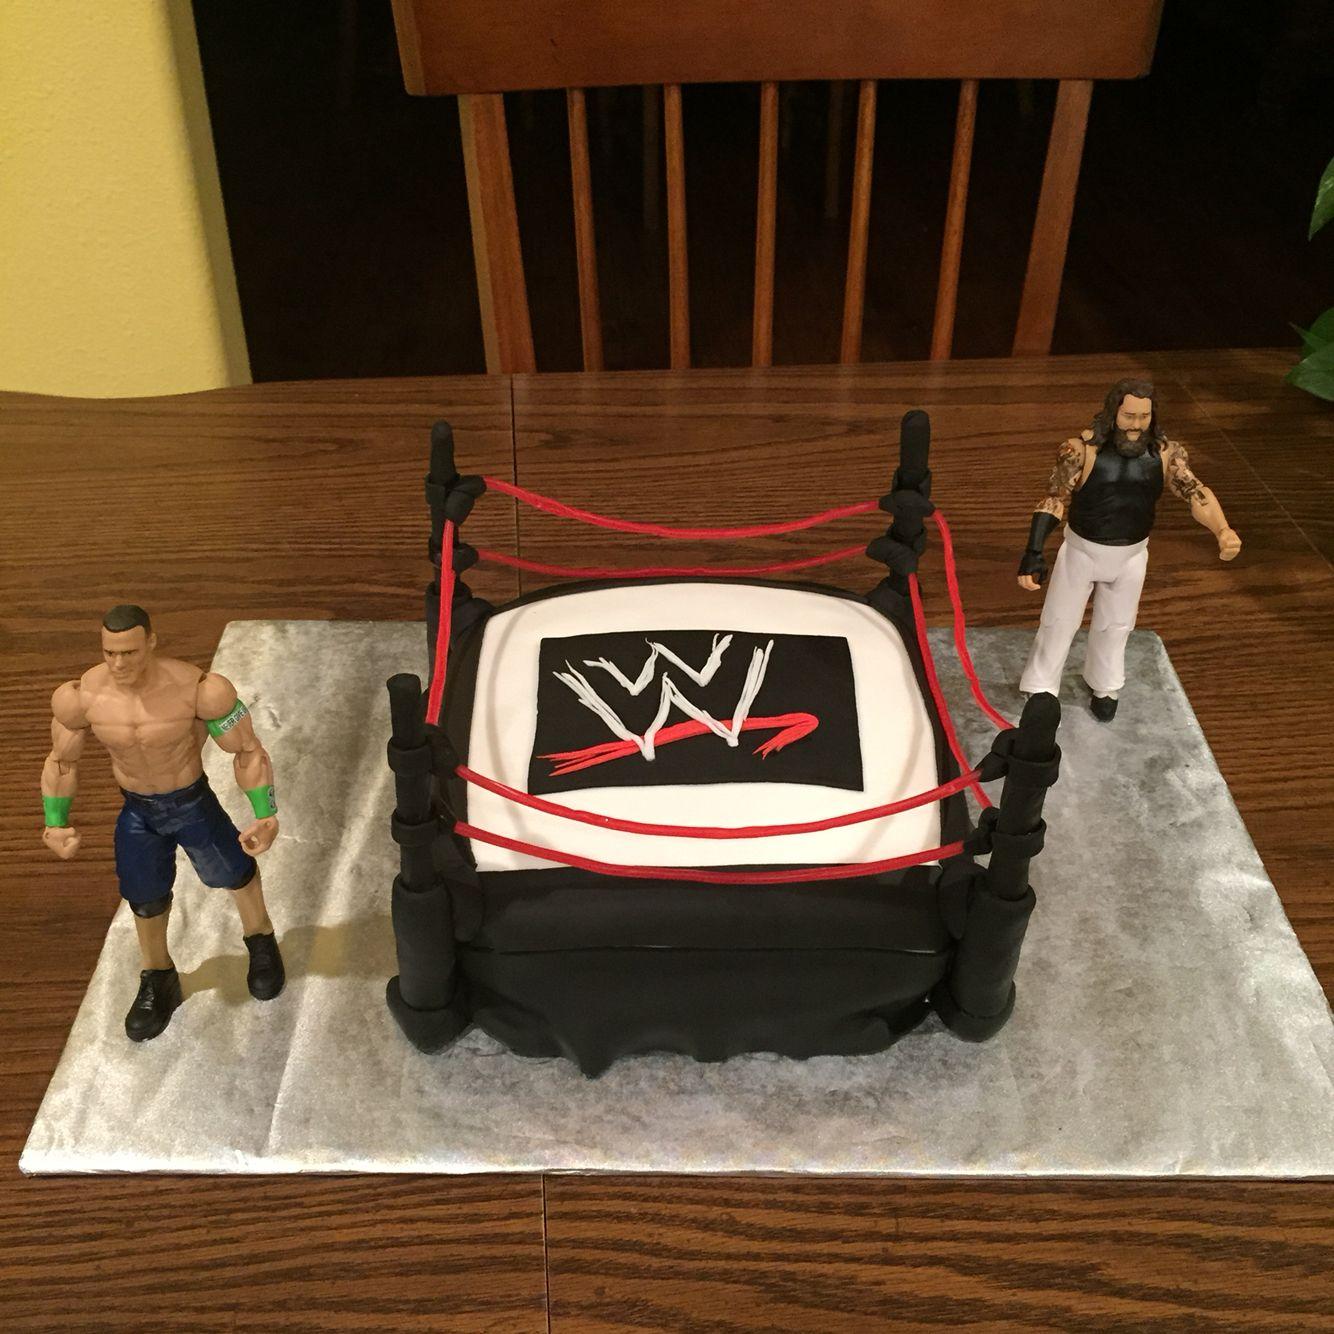 Wwe Wrestling Birthday Cake Done